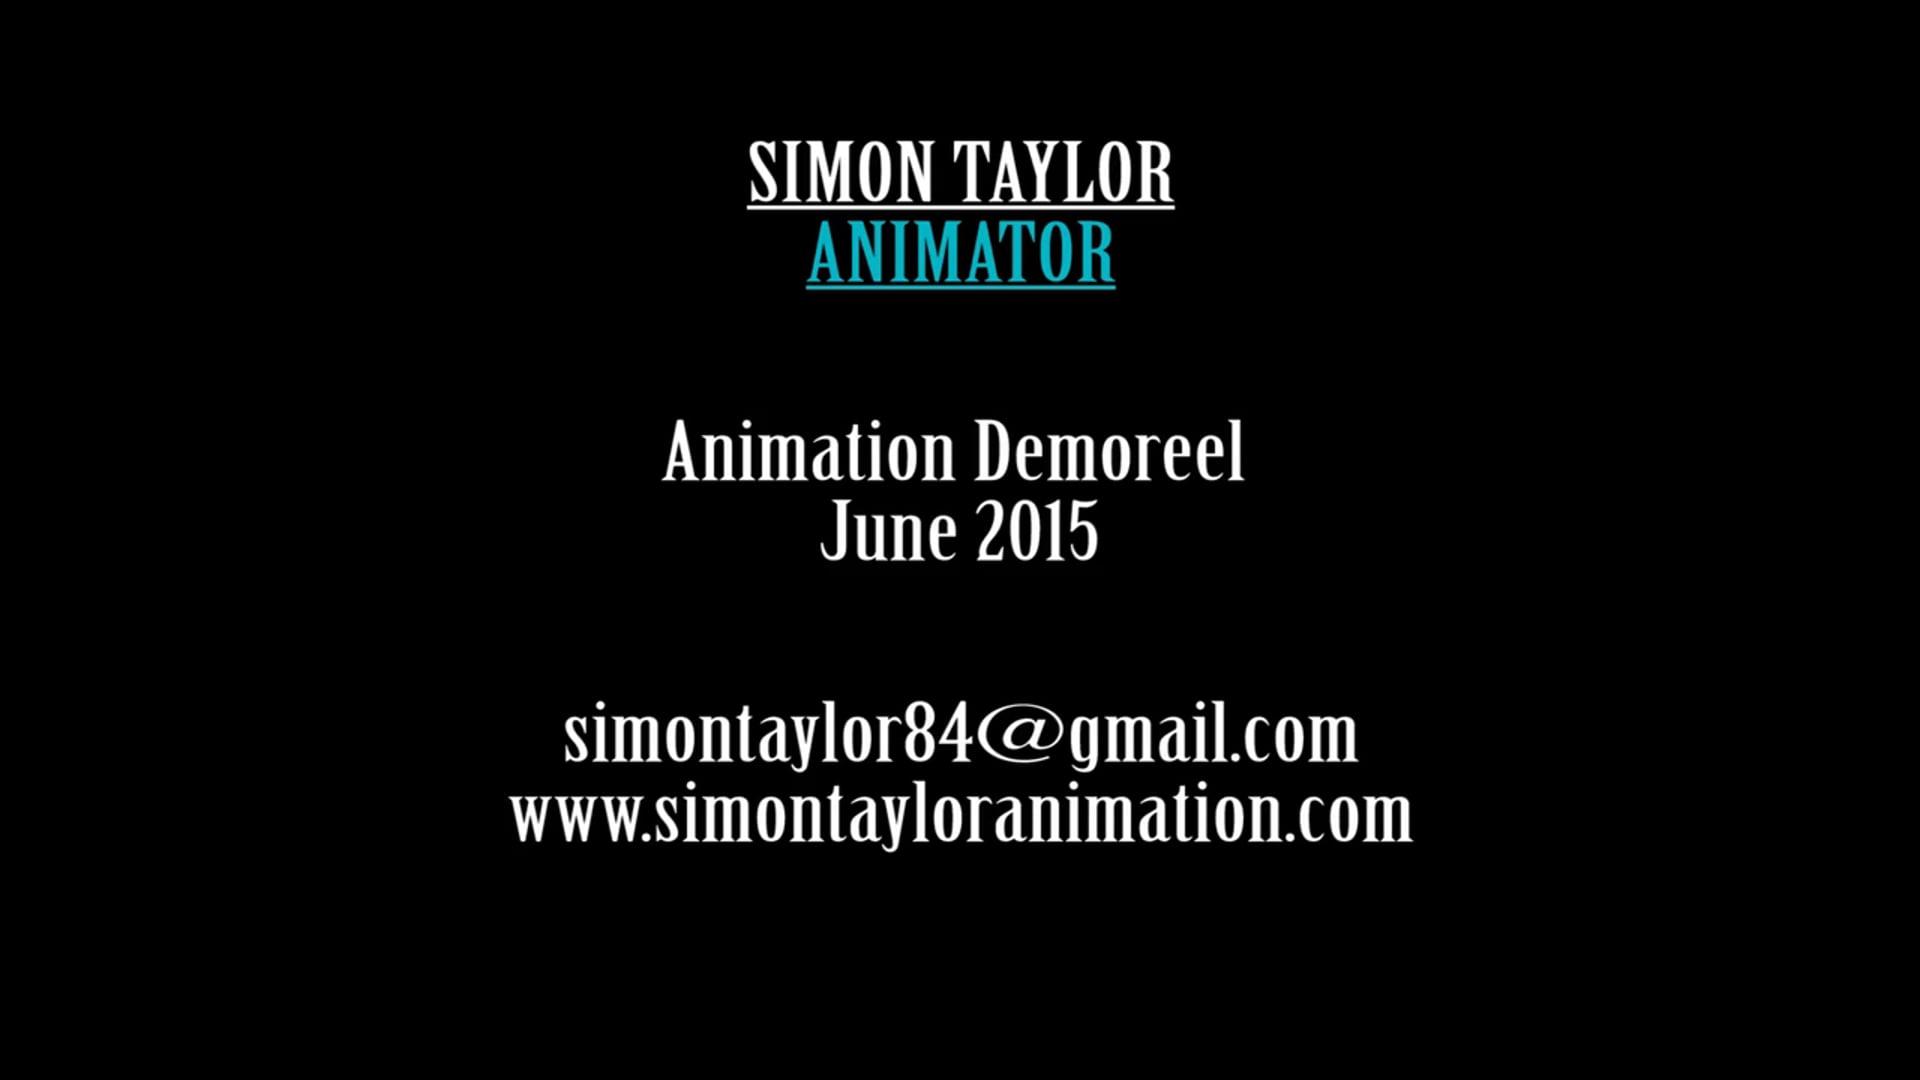 Simon Taylor Animation Reel - June 2015